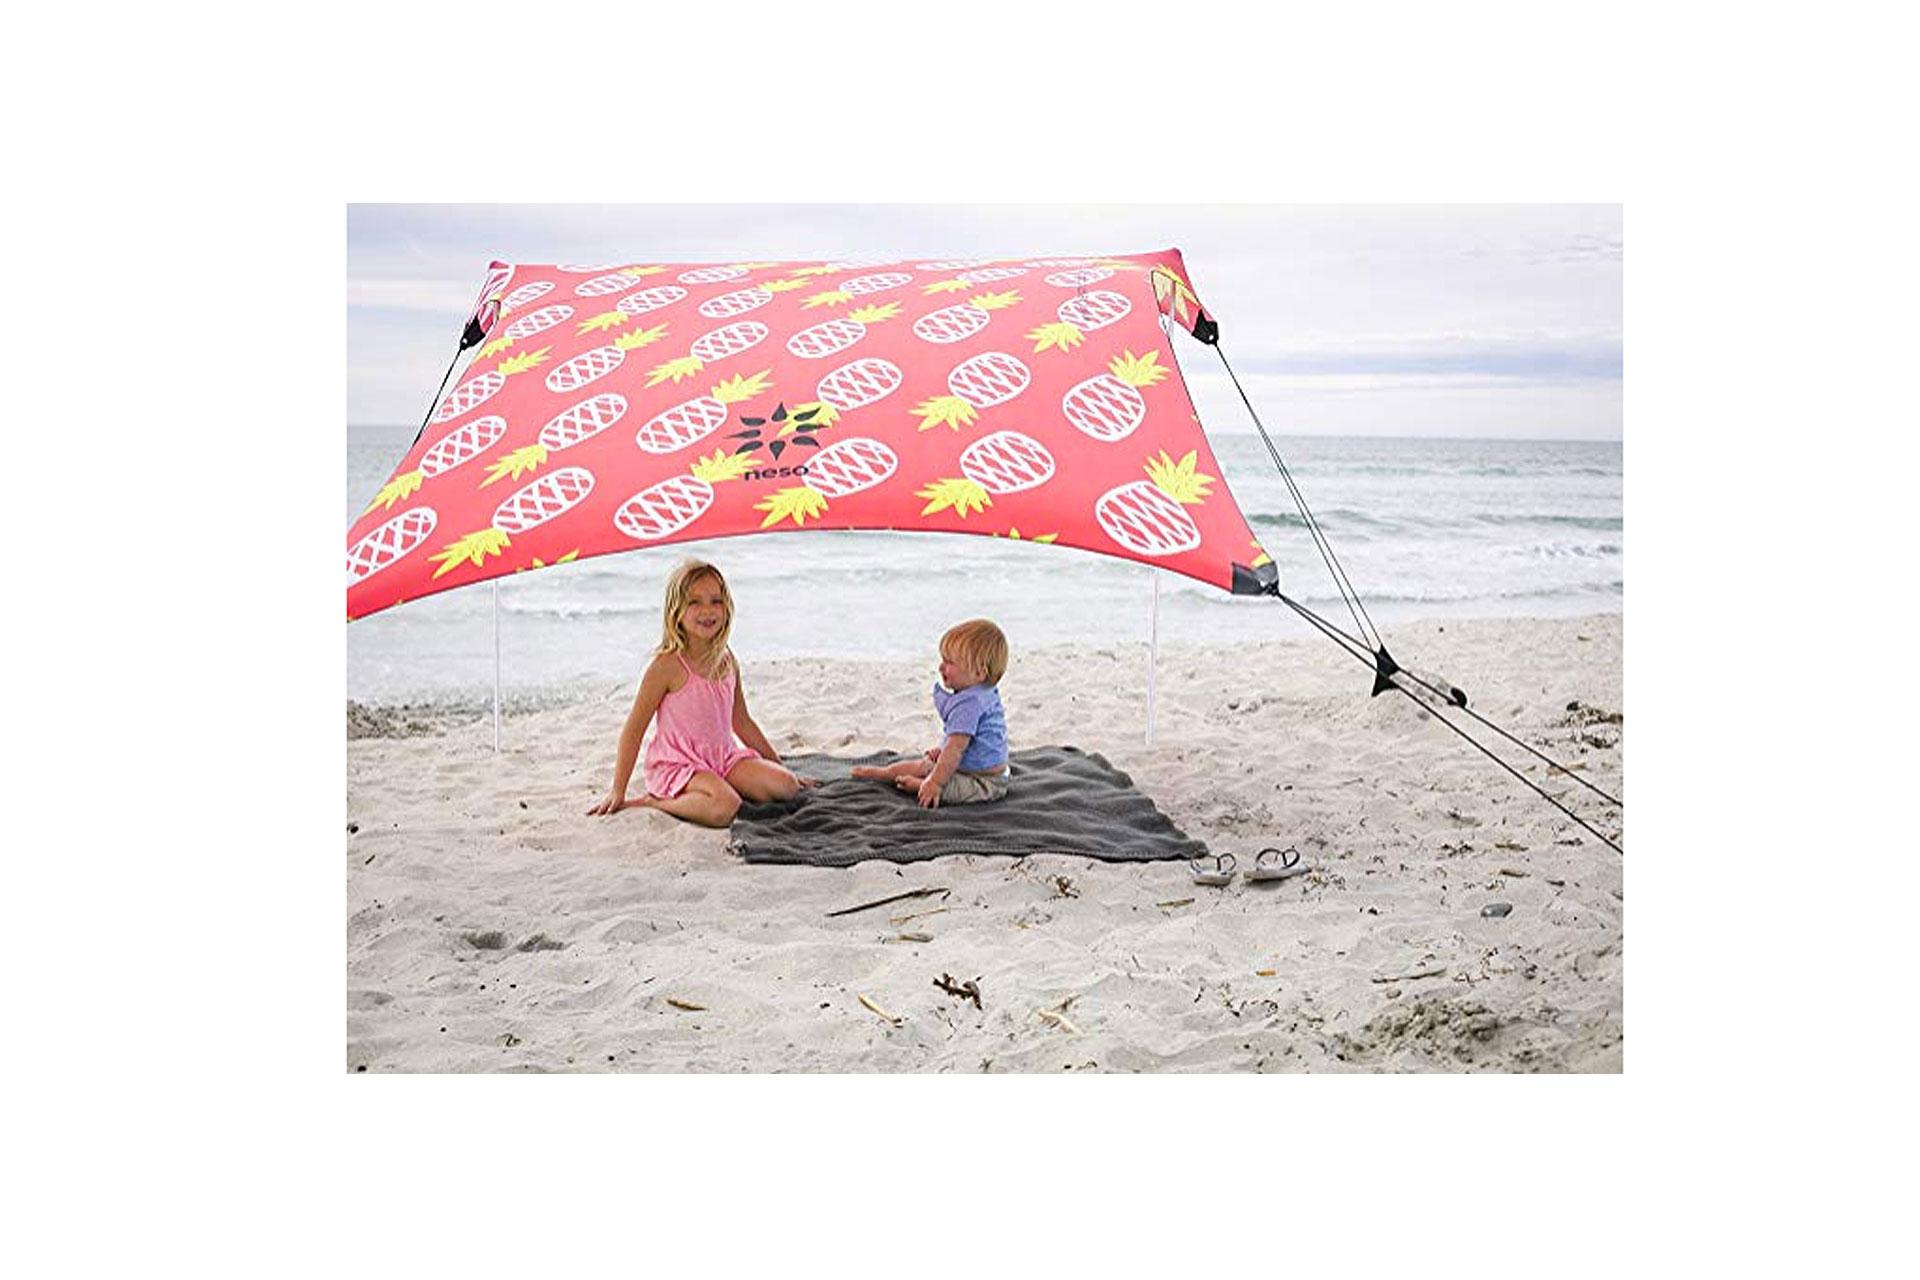 Neso Beach Tent; Courtesy of Amazon